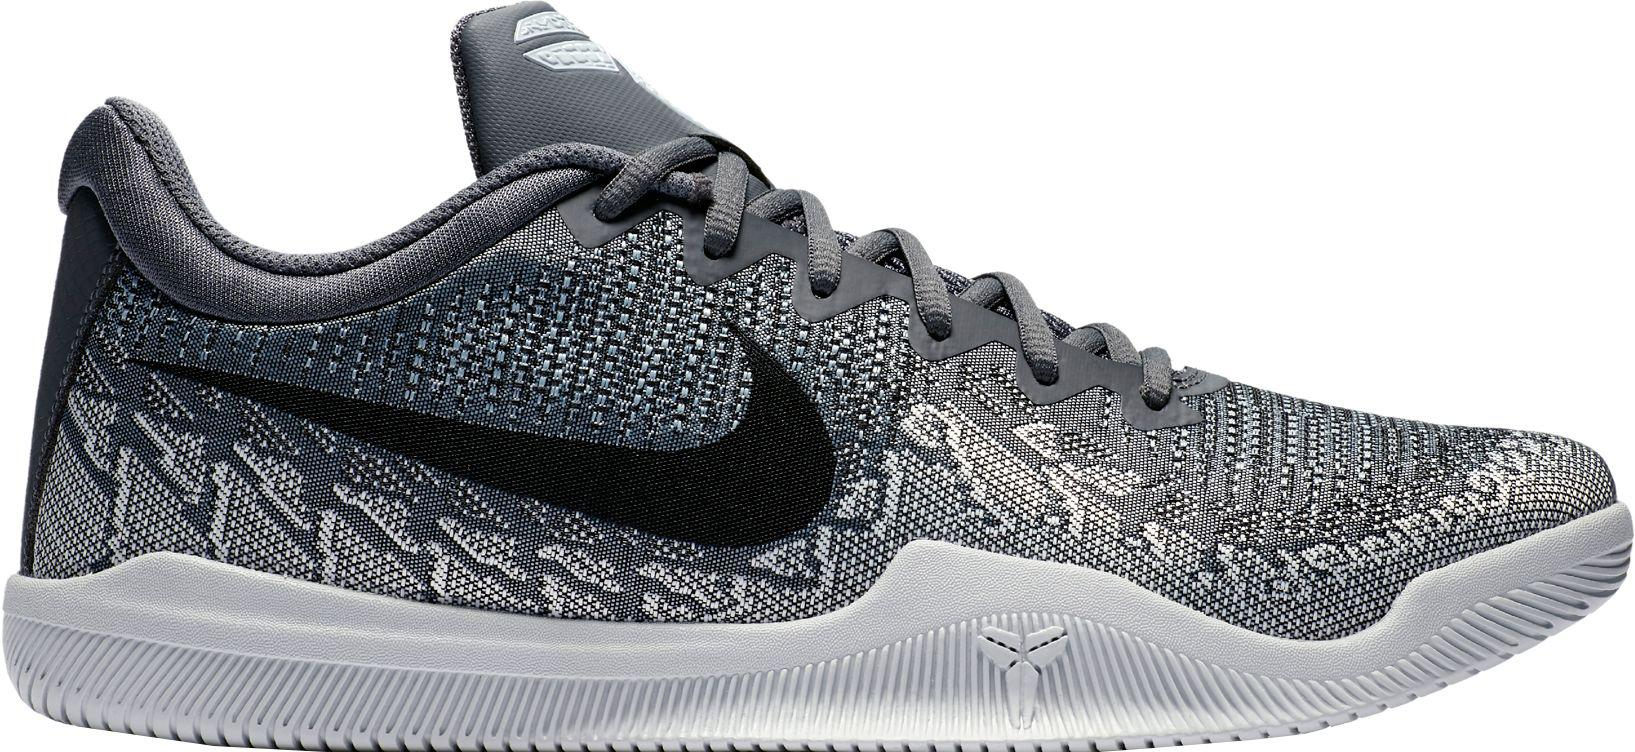 best sneakers 023c2 7eec6 Nike - Gray Kobe Mamba Rage Basketball Shoes for Men - Lyst